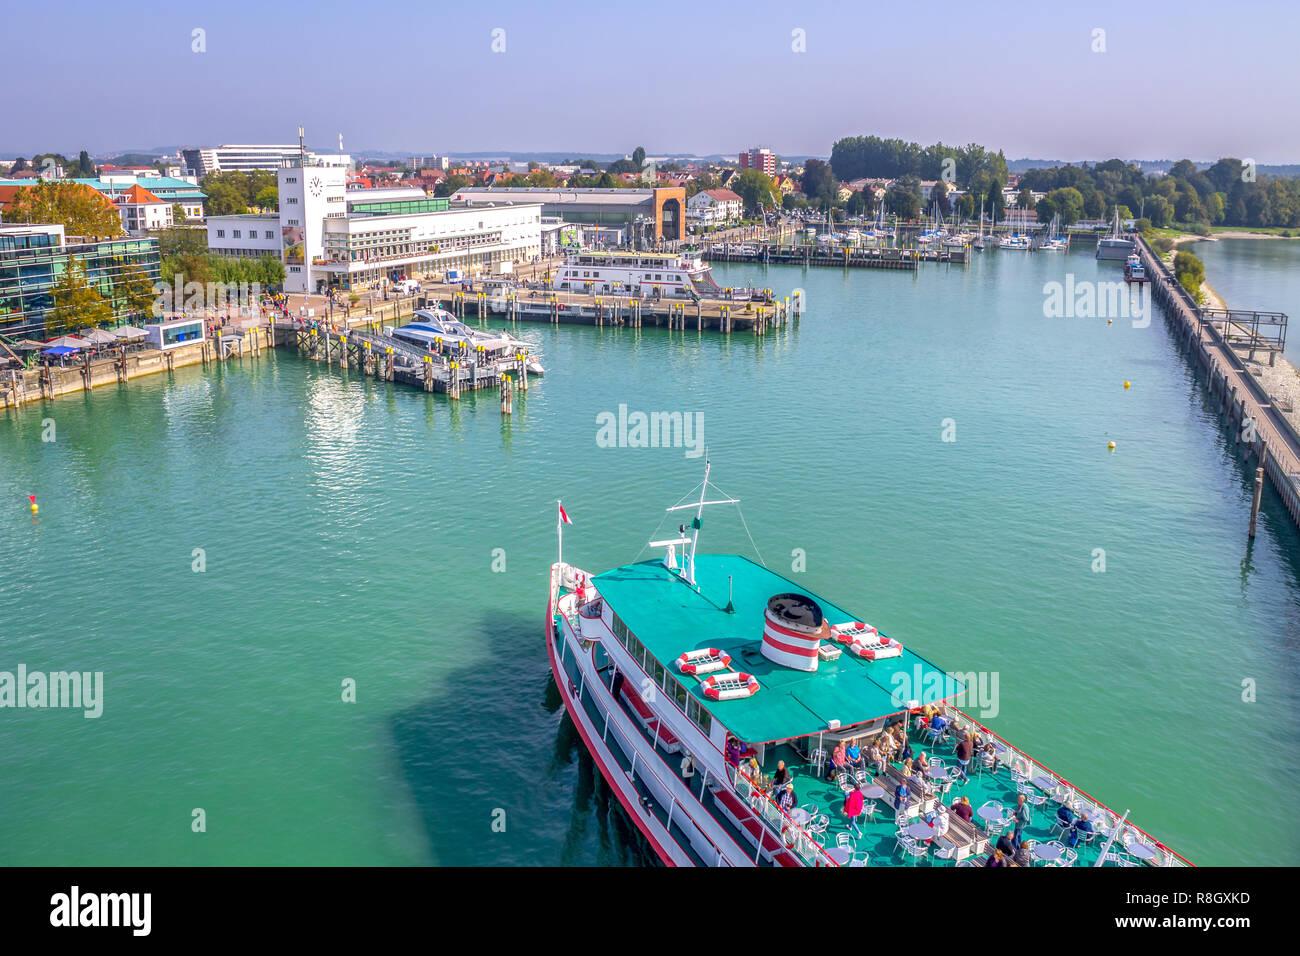 Lago Di Costanza Germania Cartina.Friedrichshafen Il Lago Di Costanza Germania Foto Stock Alamy